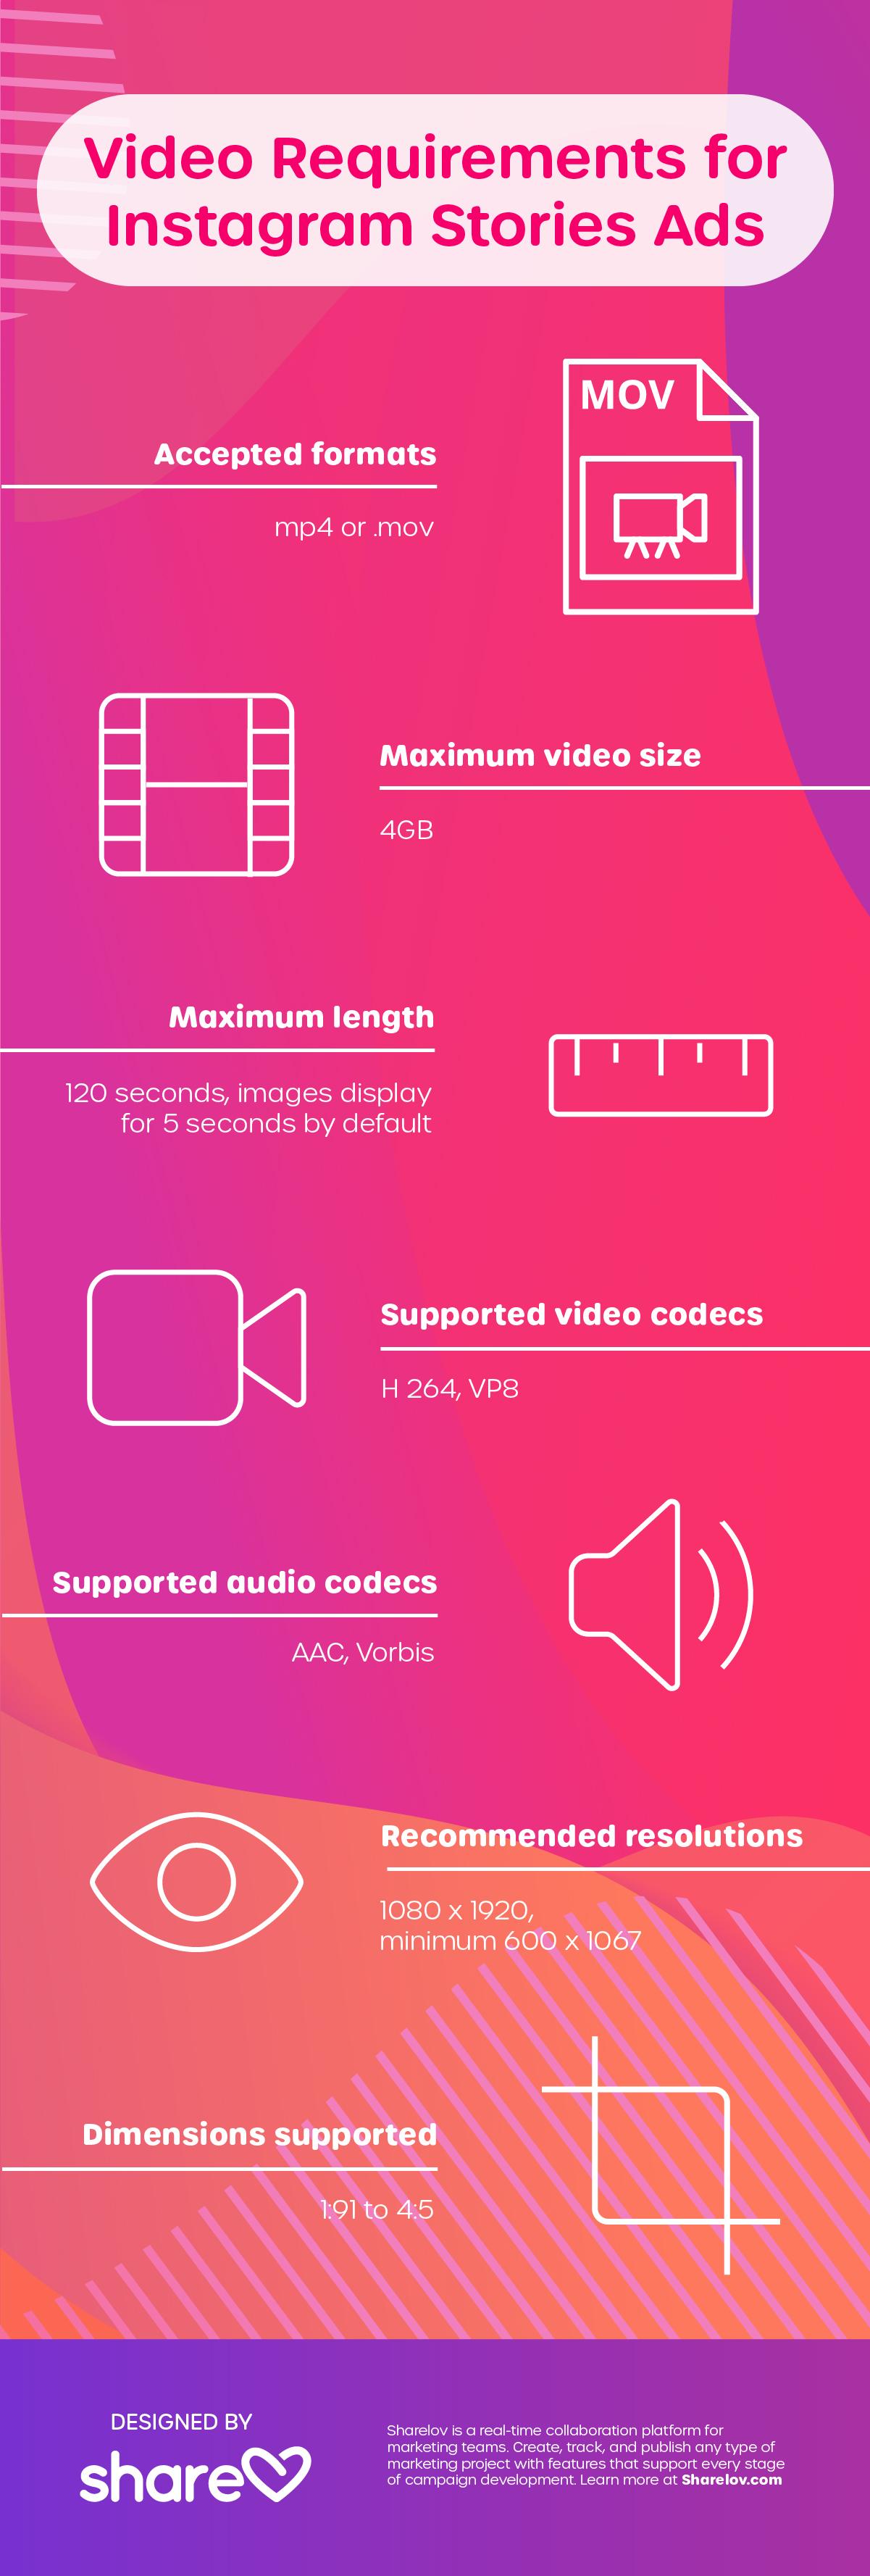 BONUS CONTENT 3 Video Requirements for Instagram Stories Ads